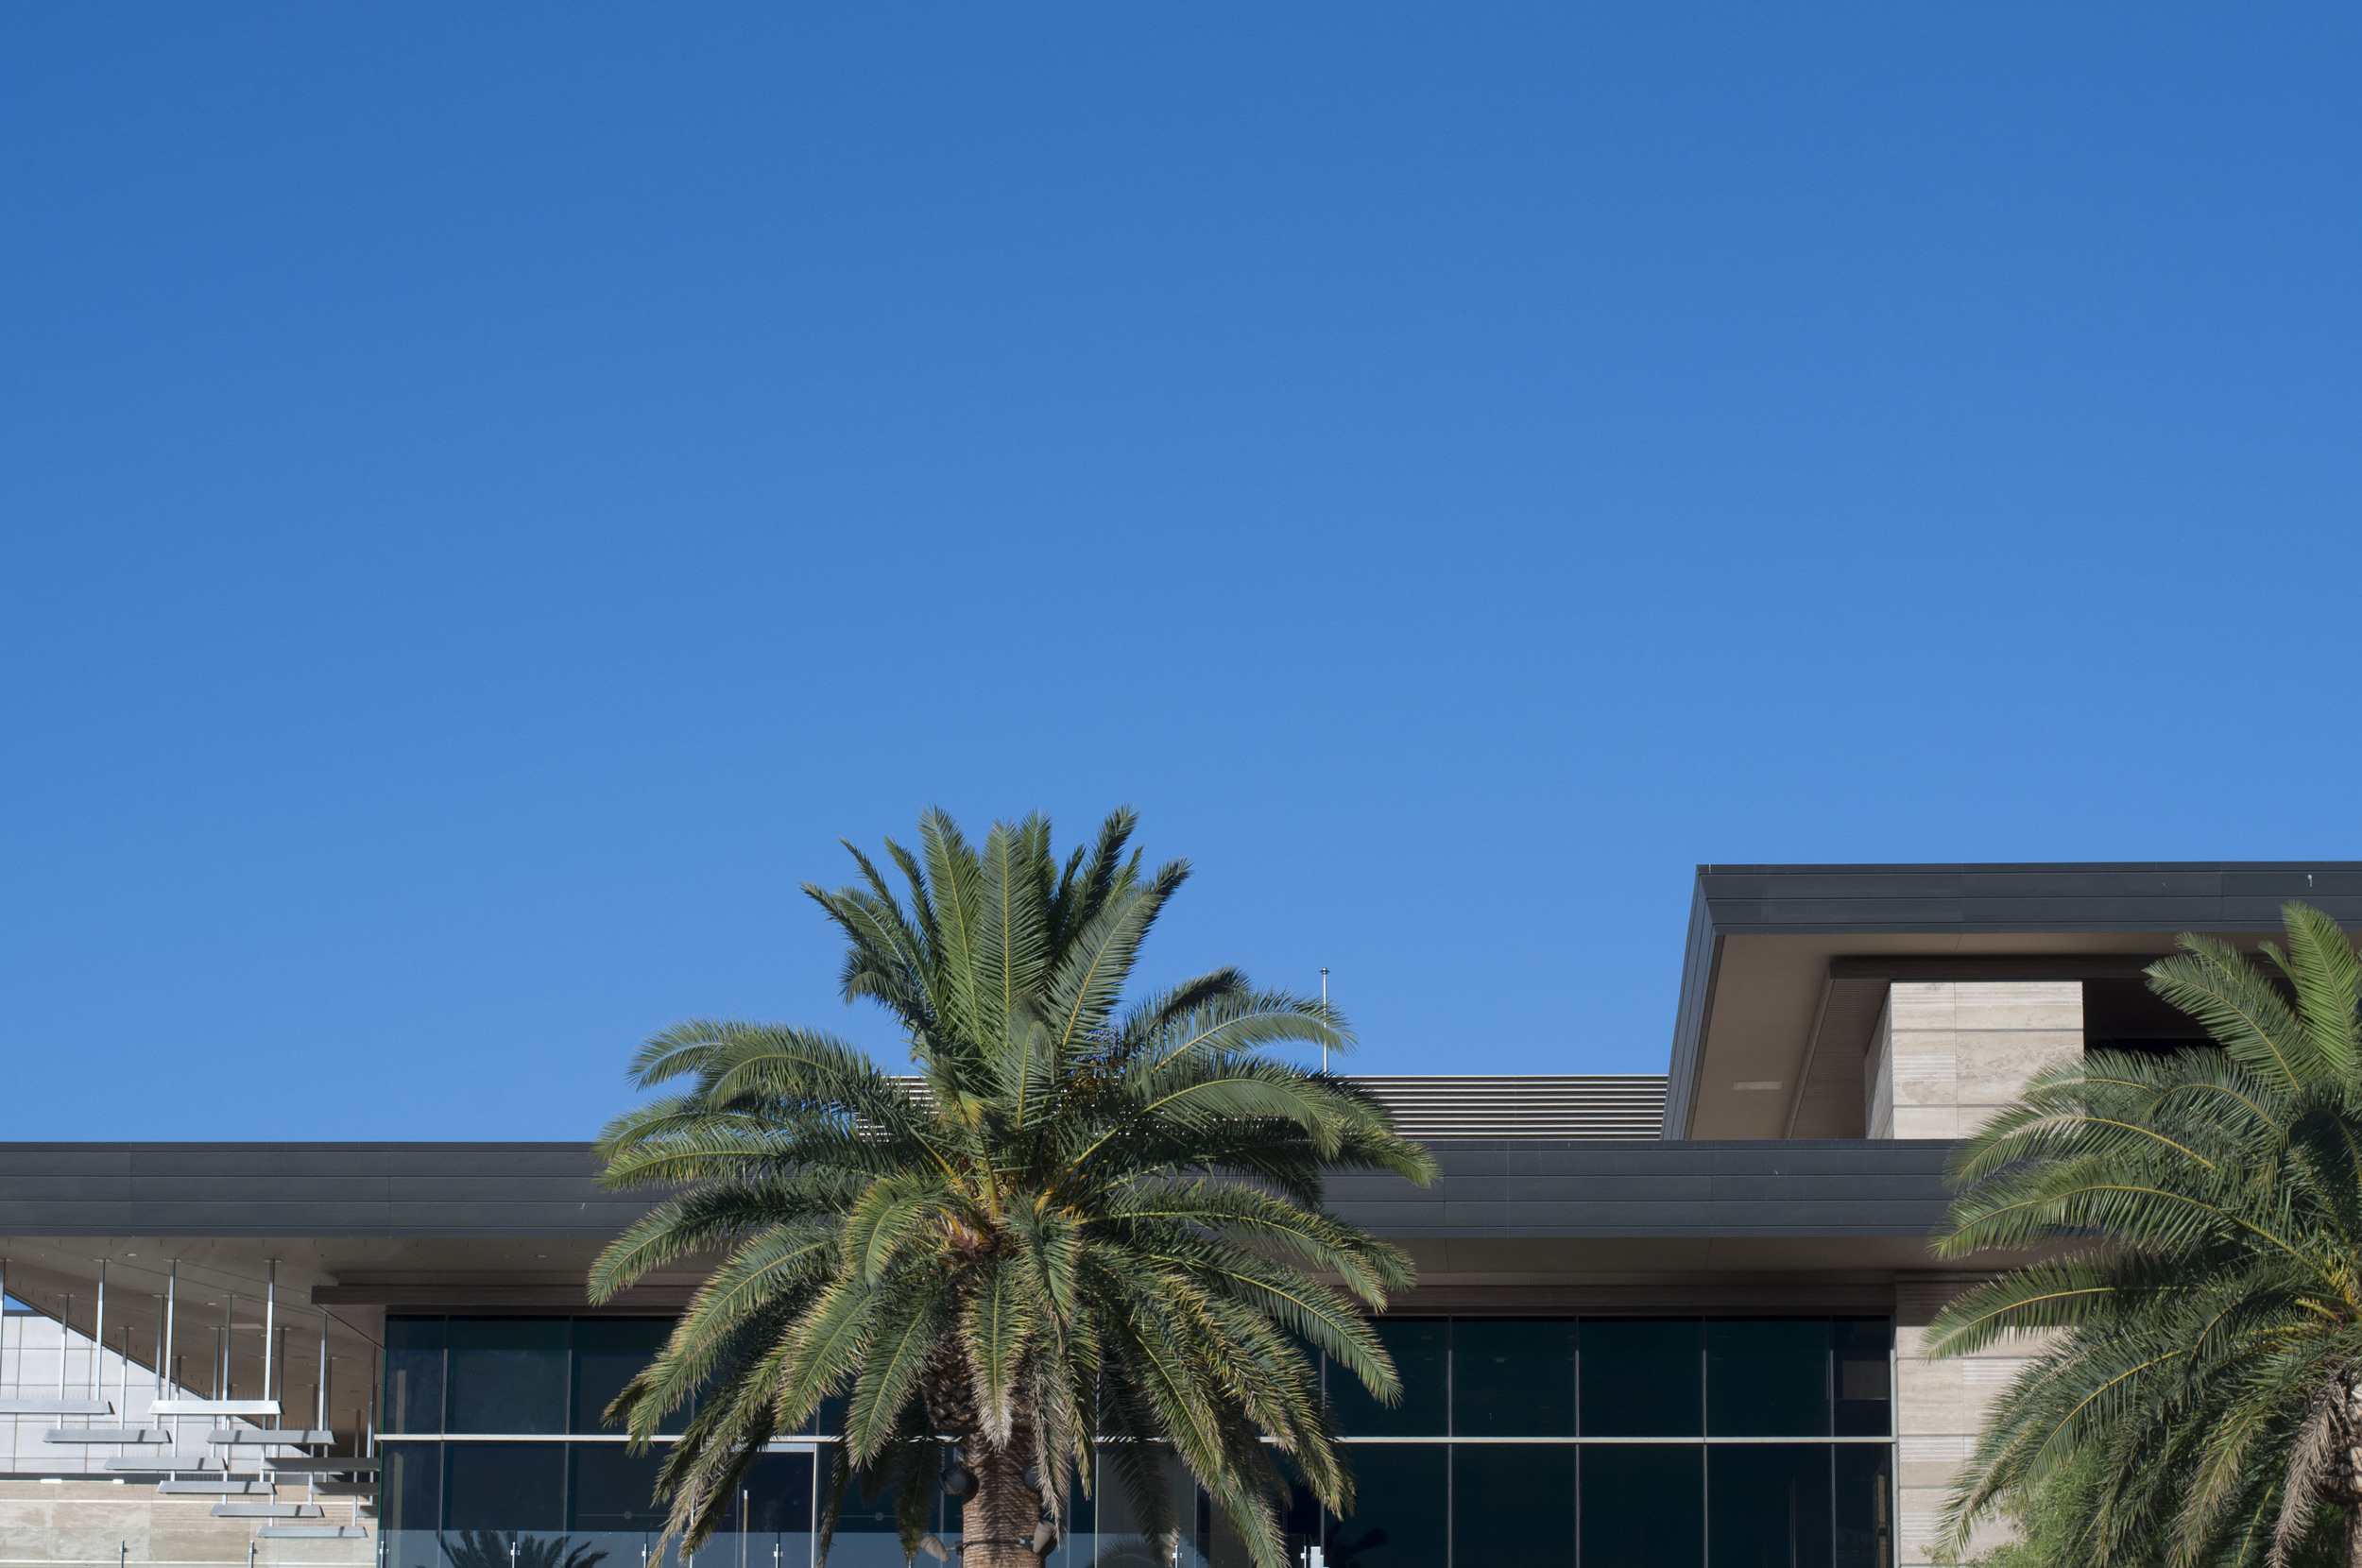 Las Vegas_59.jpg